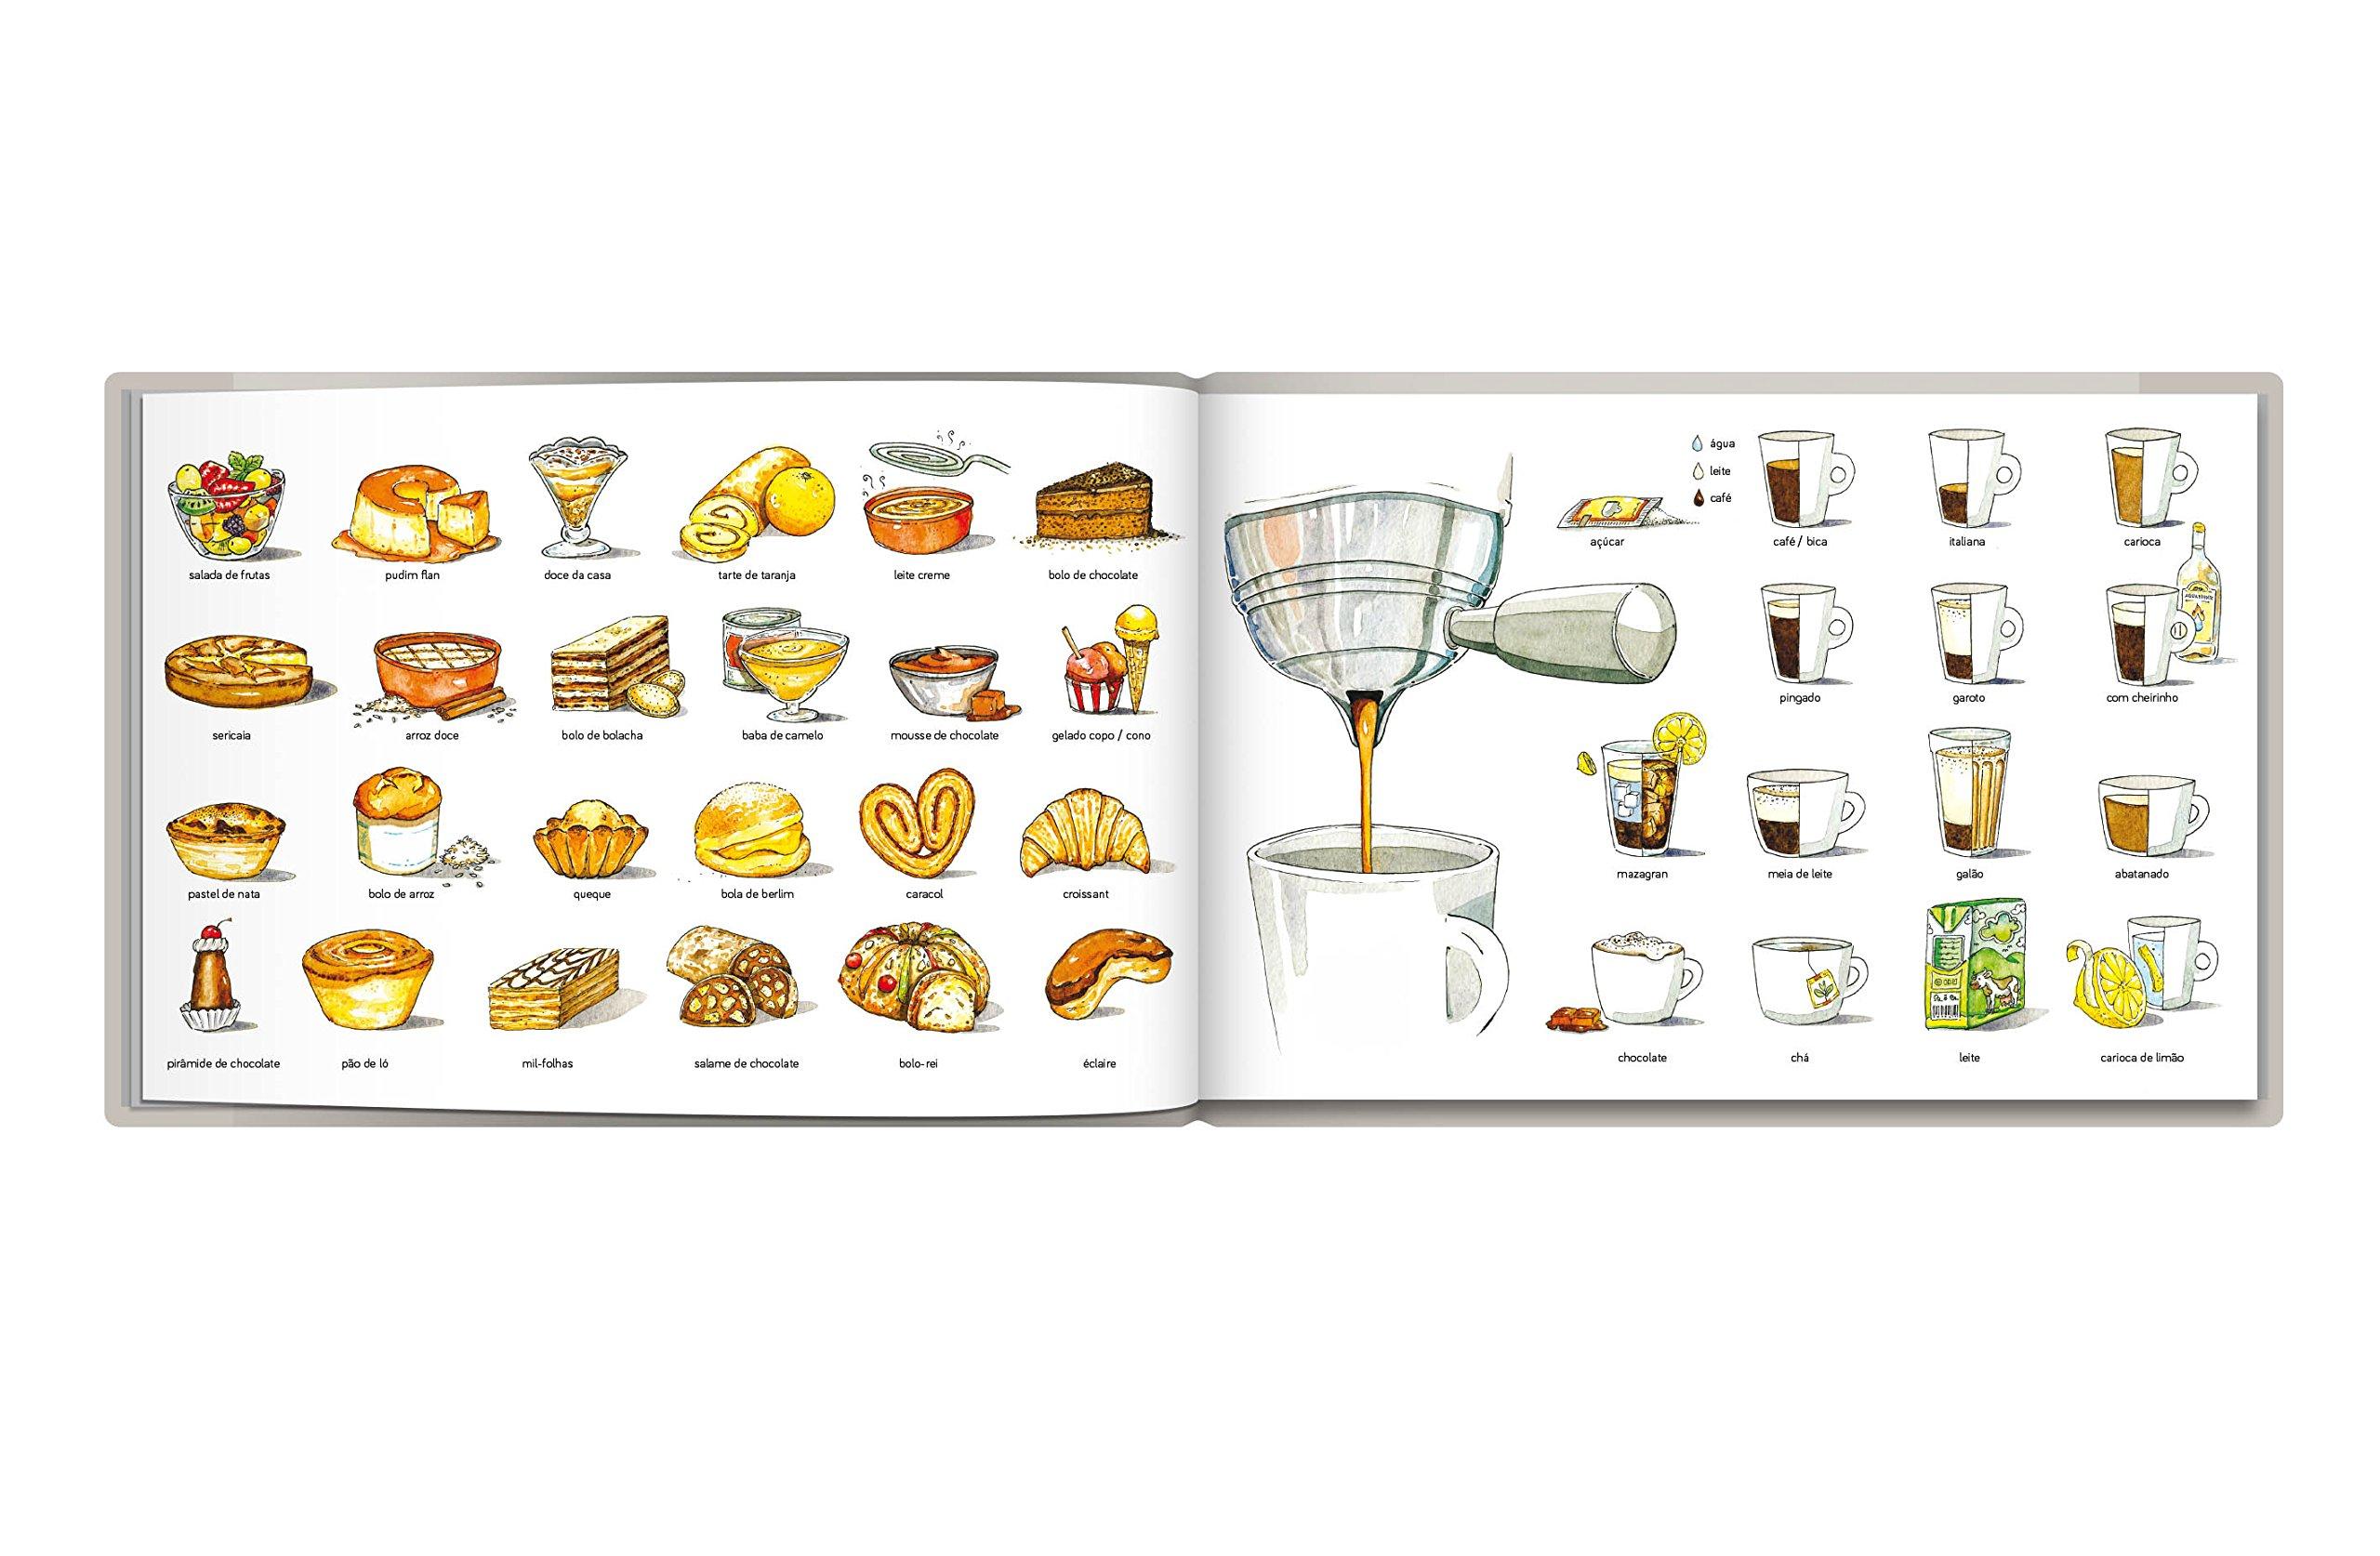 Lisboa o guia ilustrado: Amir-Alexandros Afendras, Majericon: 9789892069692: Amazon.com: Books